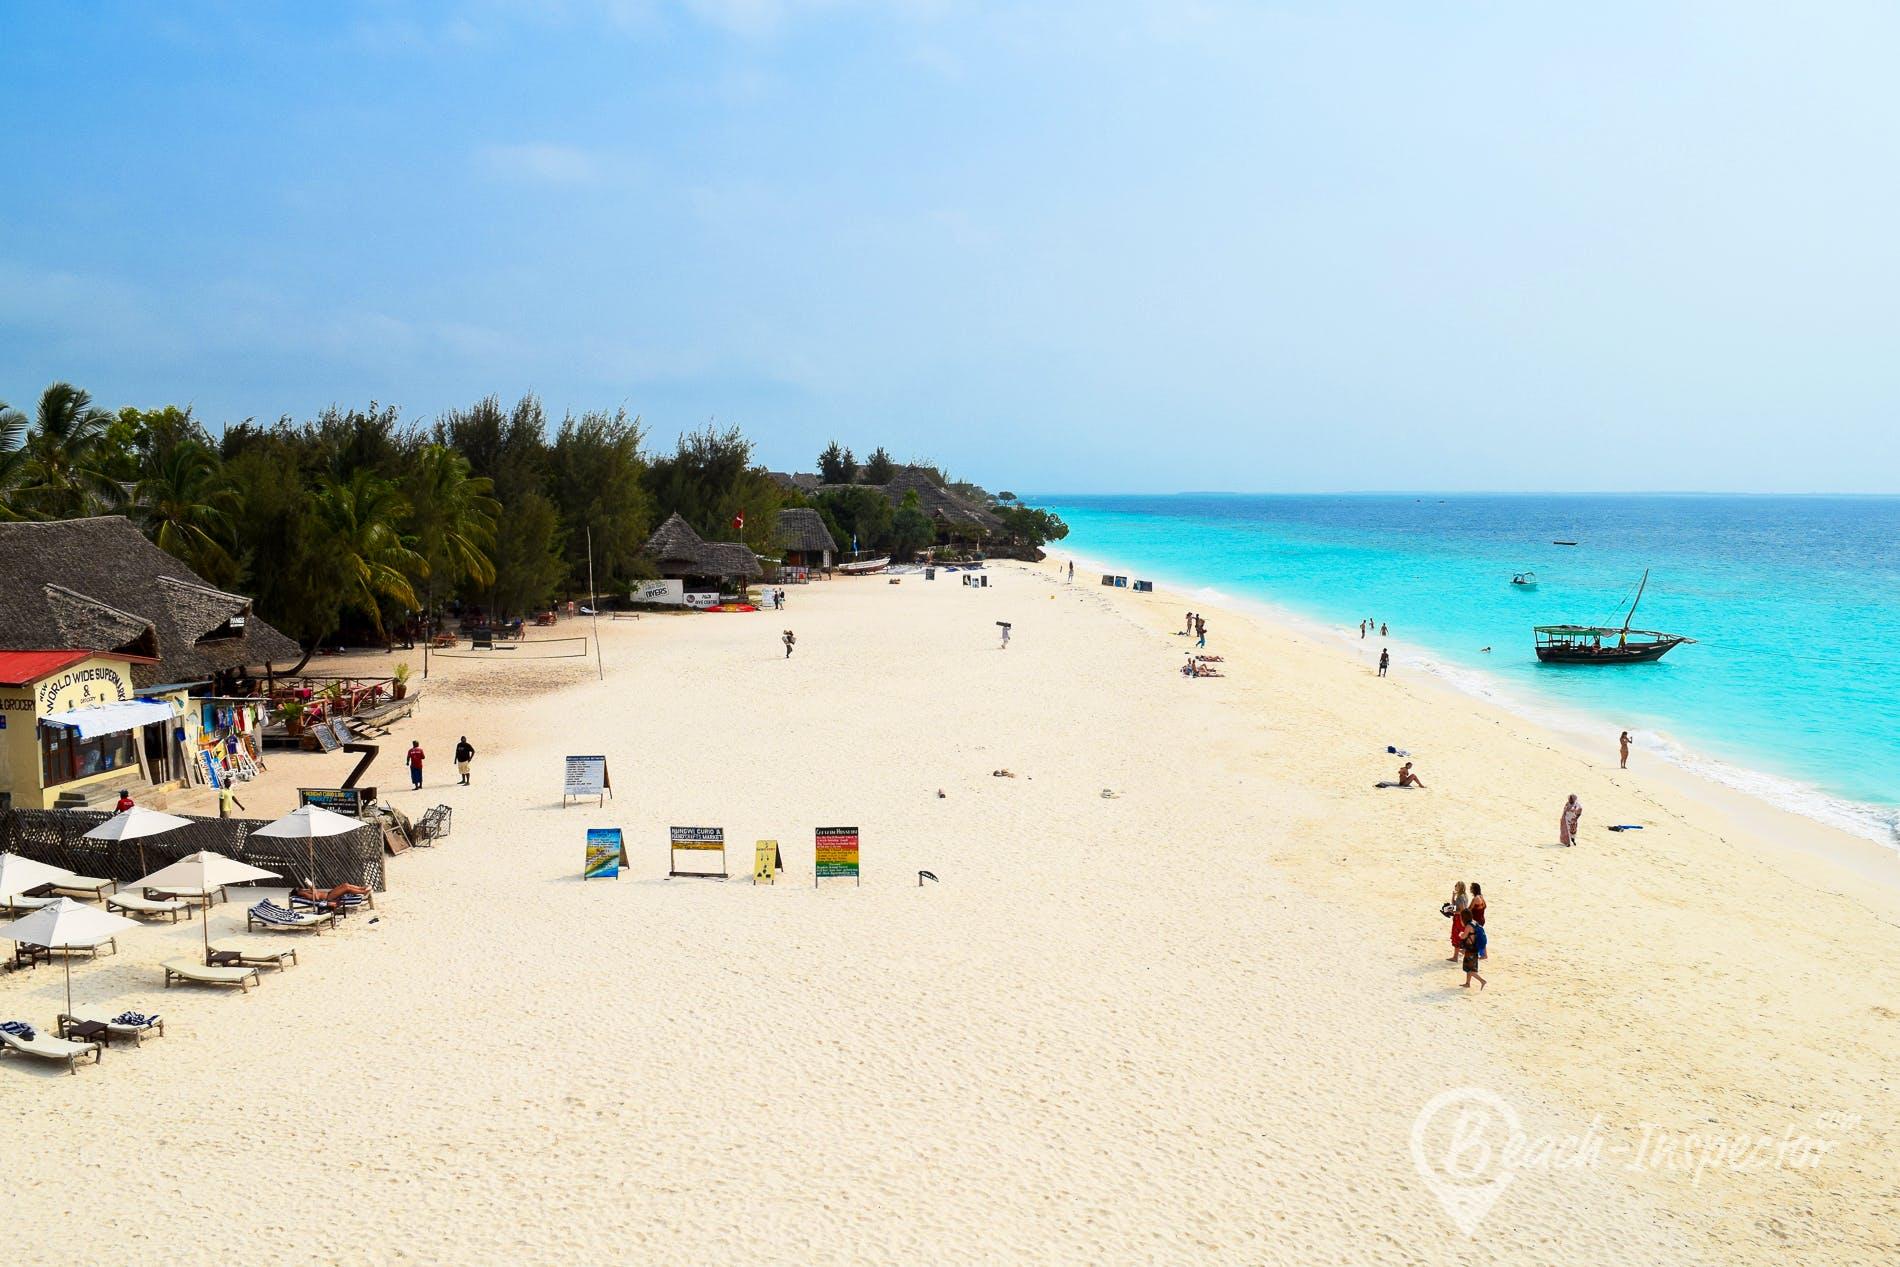 Beach Nungwi Beach West, Zanzibar,